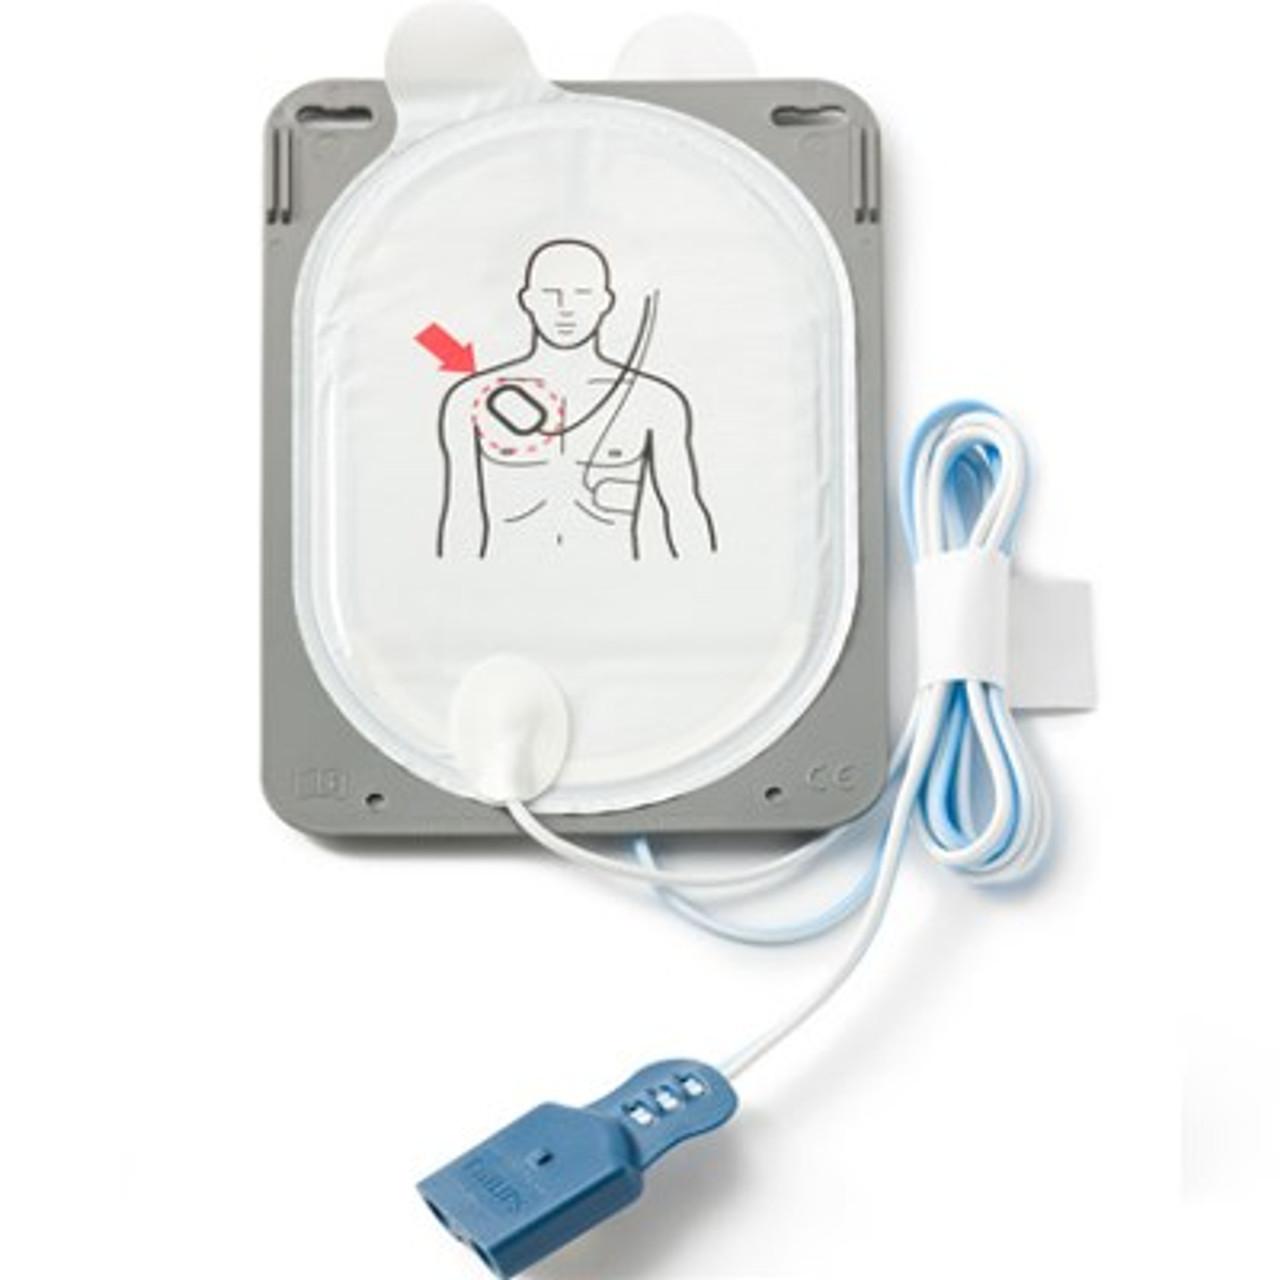 Philips HeartStart FR3 AED ECG Bundle with FAA-Compliant Battery, SMART Pads, & User Documentation